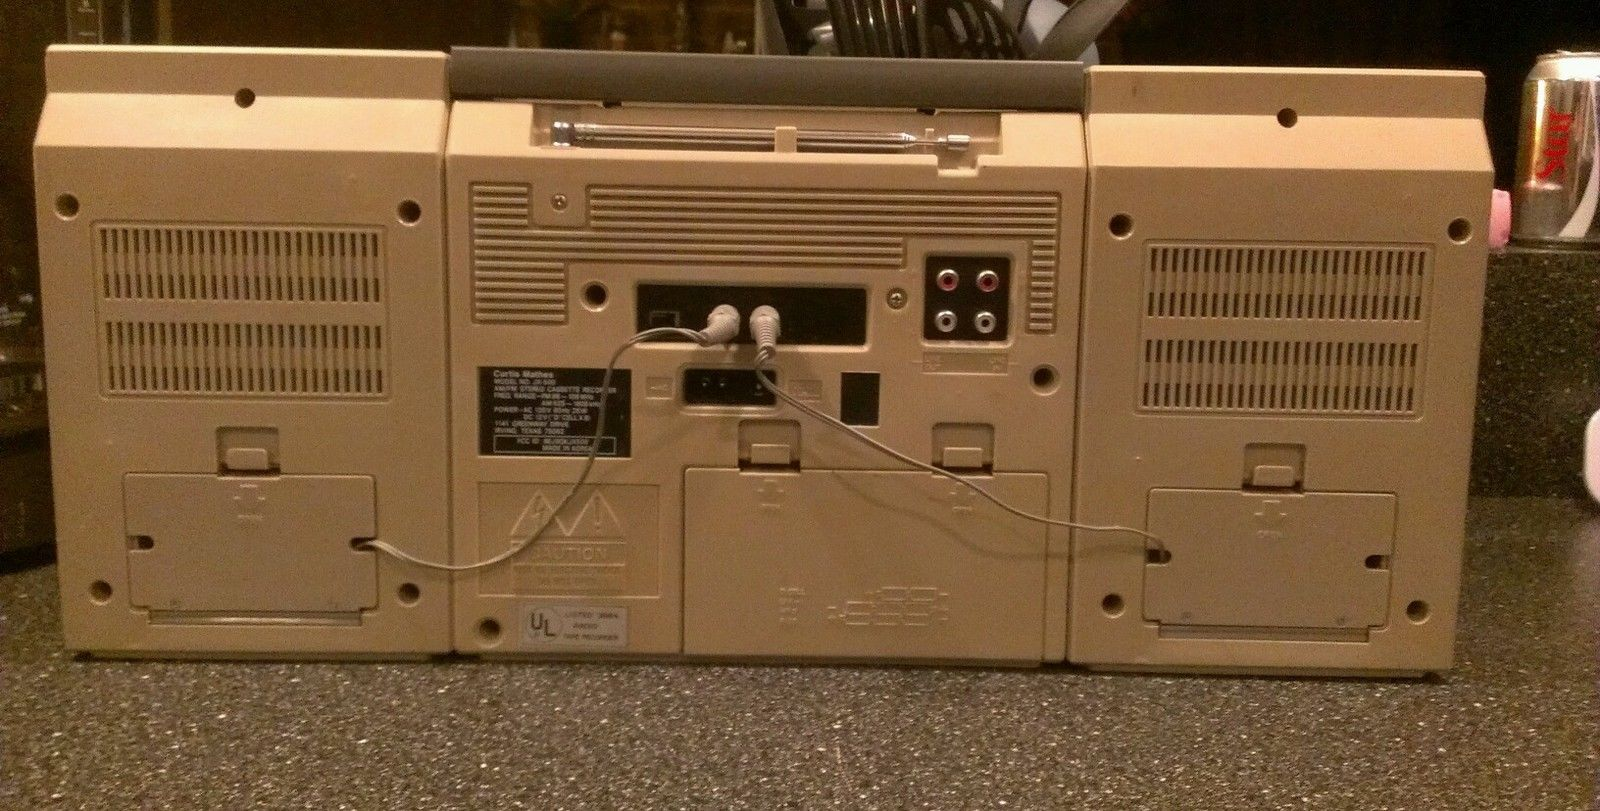 A nice silver face Curtis Mathes JX-500 boom box